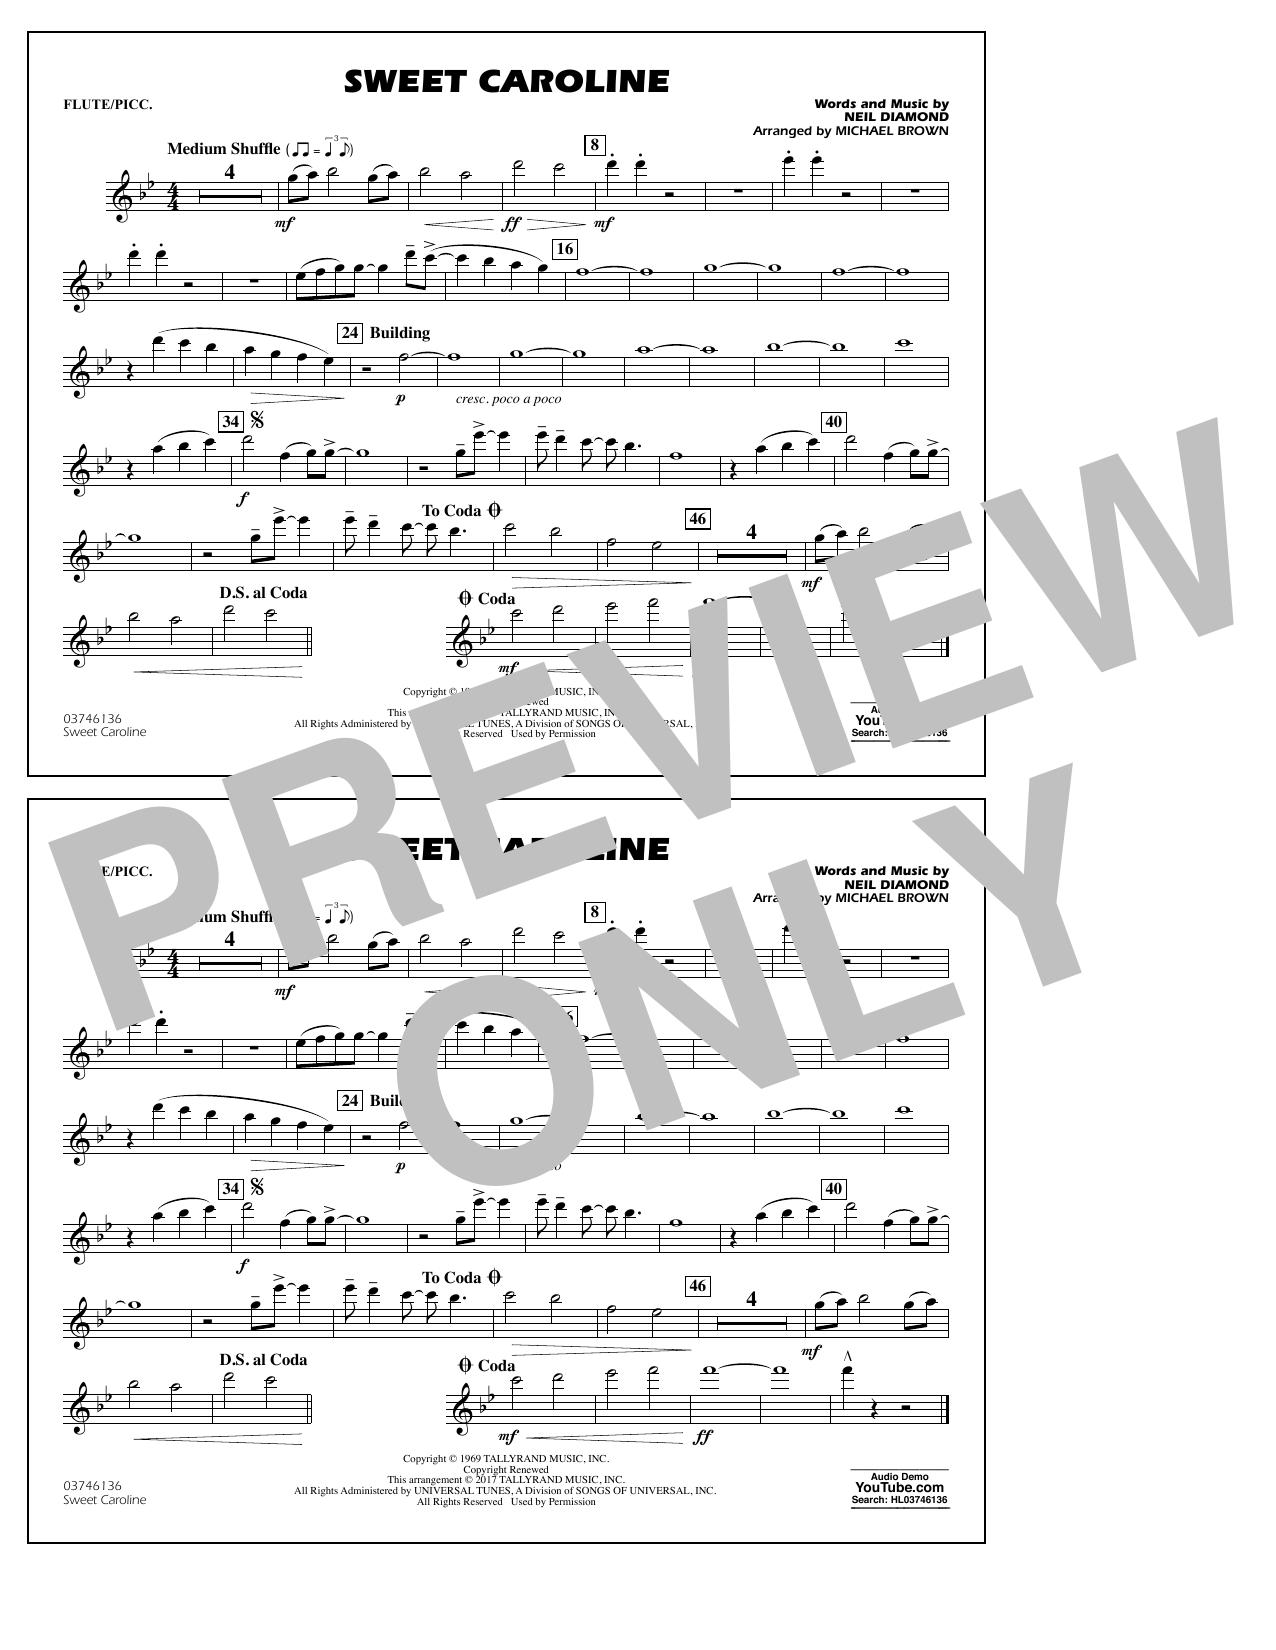 Sweet Caroline - Flute/Piccolo Sheet Music